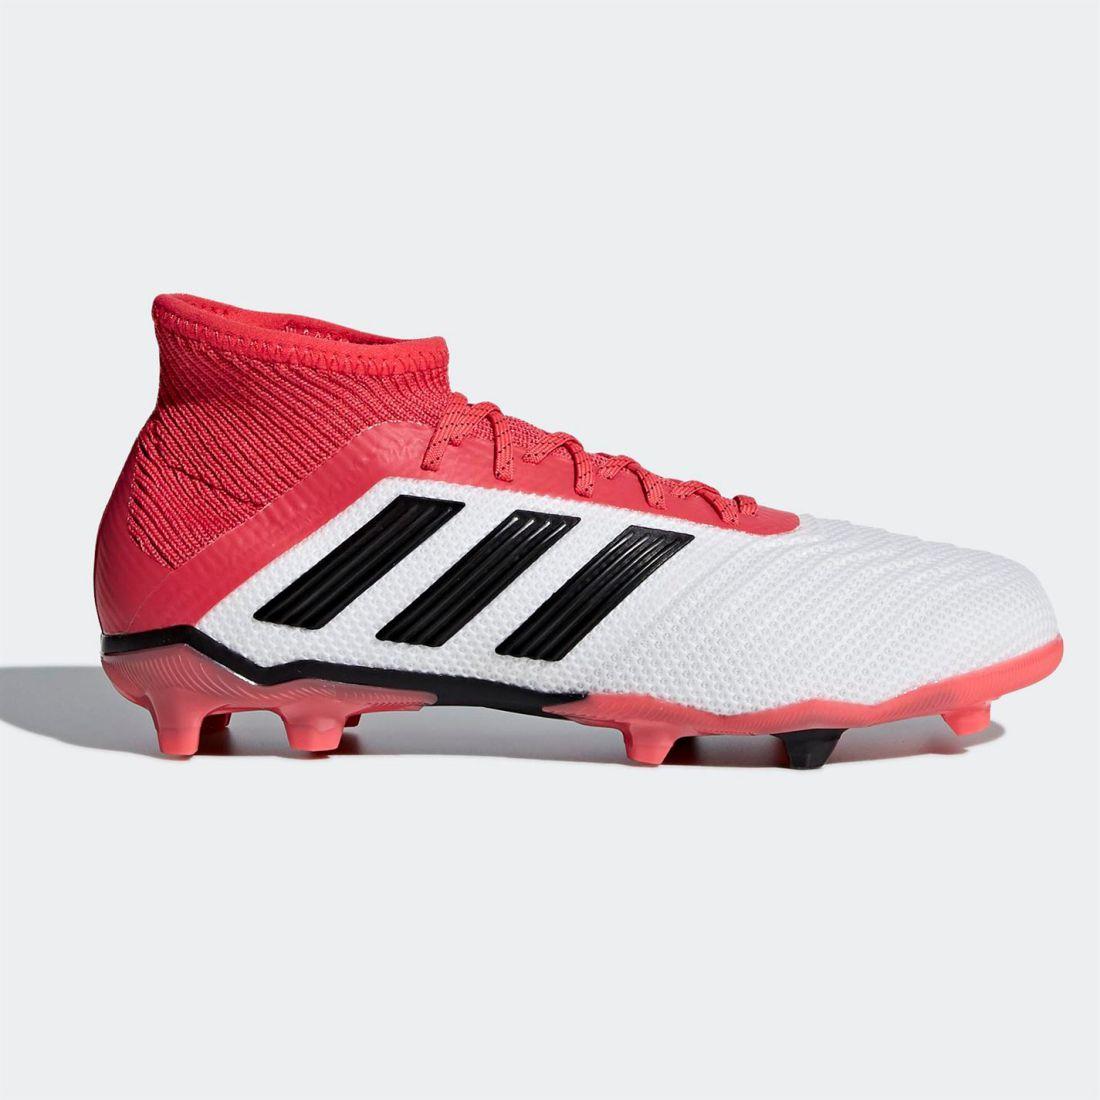 sports shoes fd880 0216c adidas-Predator-18-1-FG-Childrens-Football-Boots-